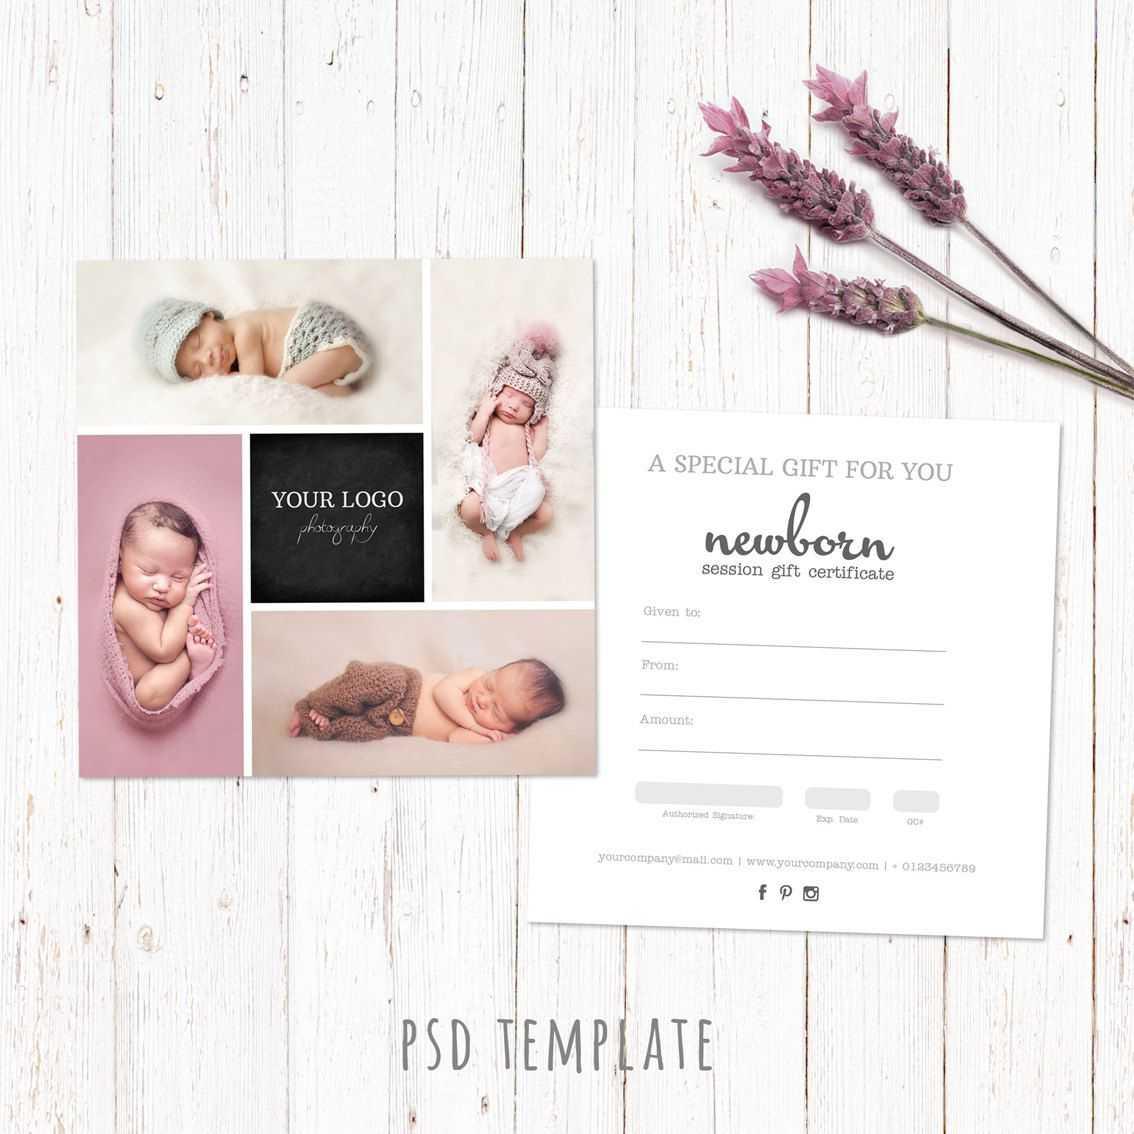 Gift Certificate Template. Newborn Session Photography Gift Inside Photoshoot Gift Certificate Template